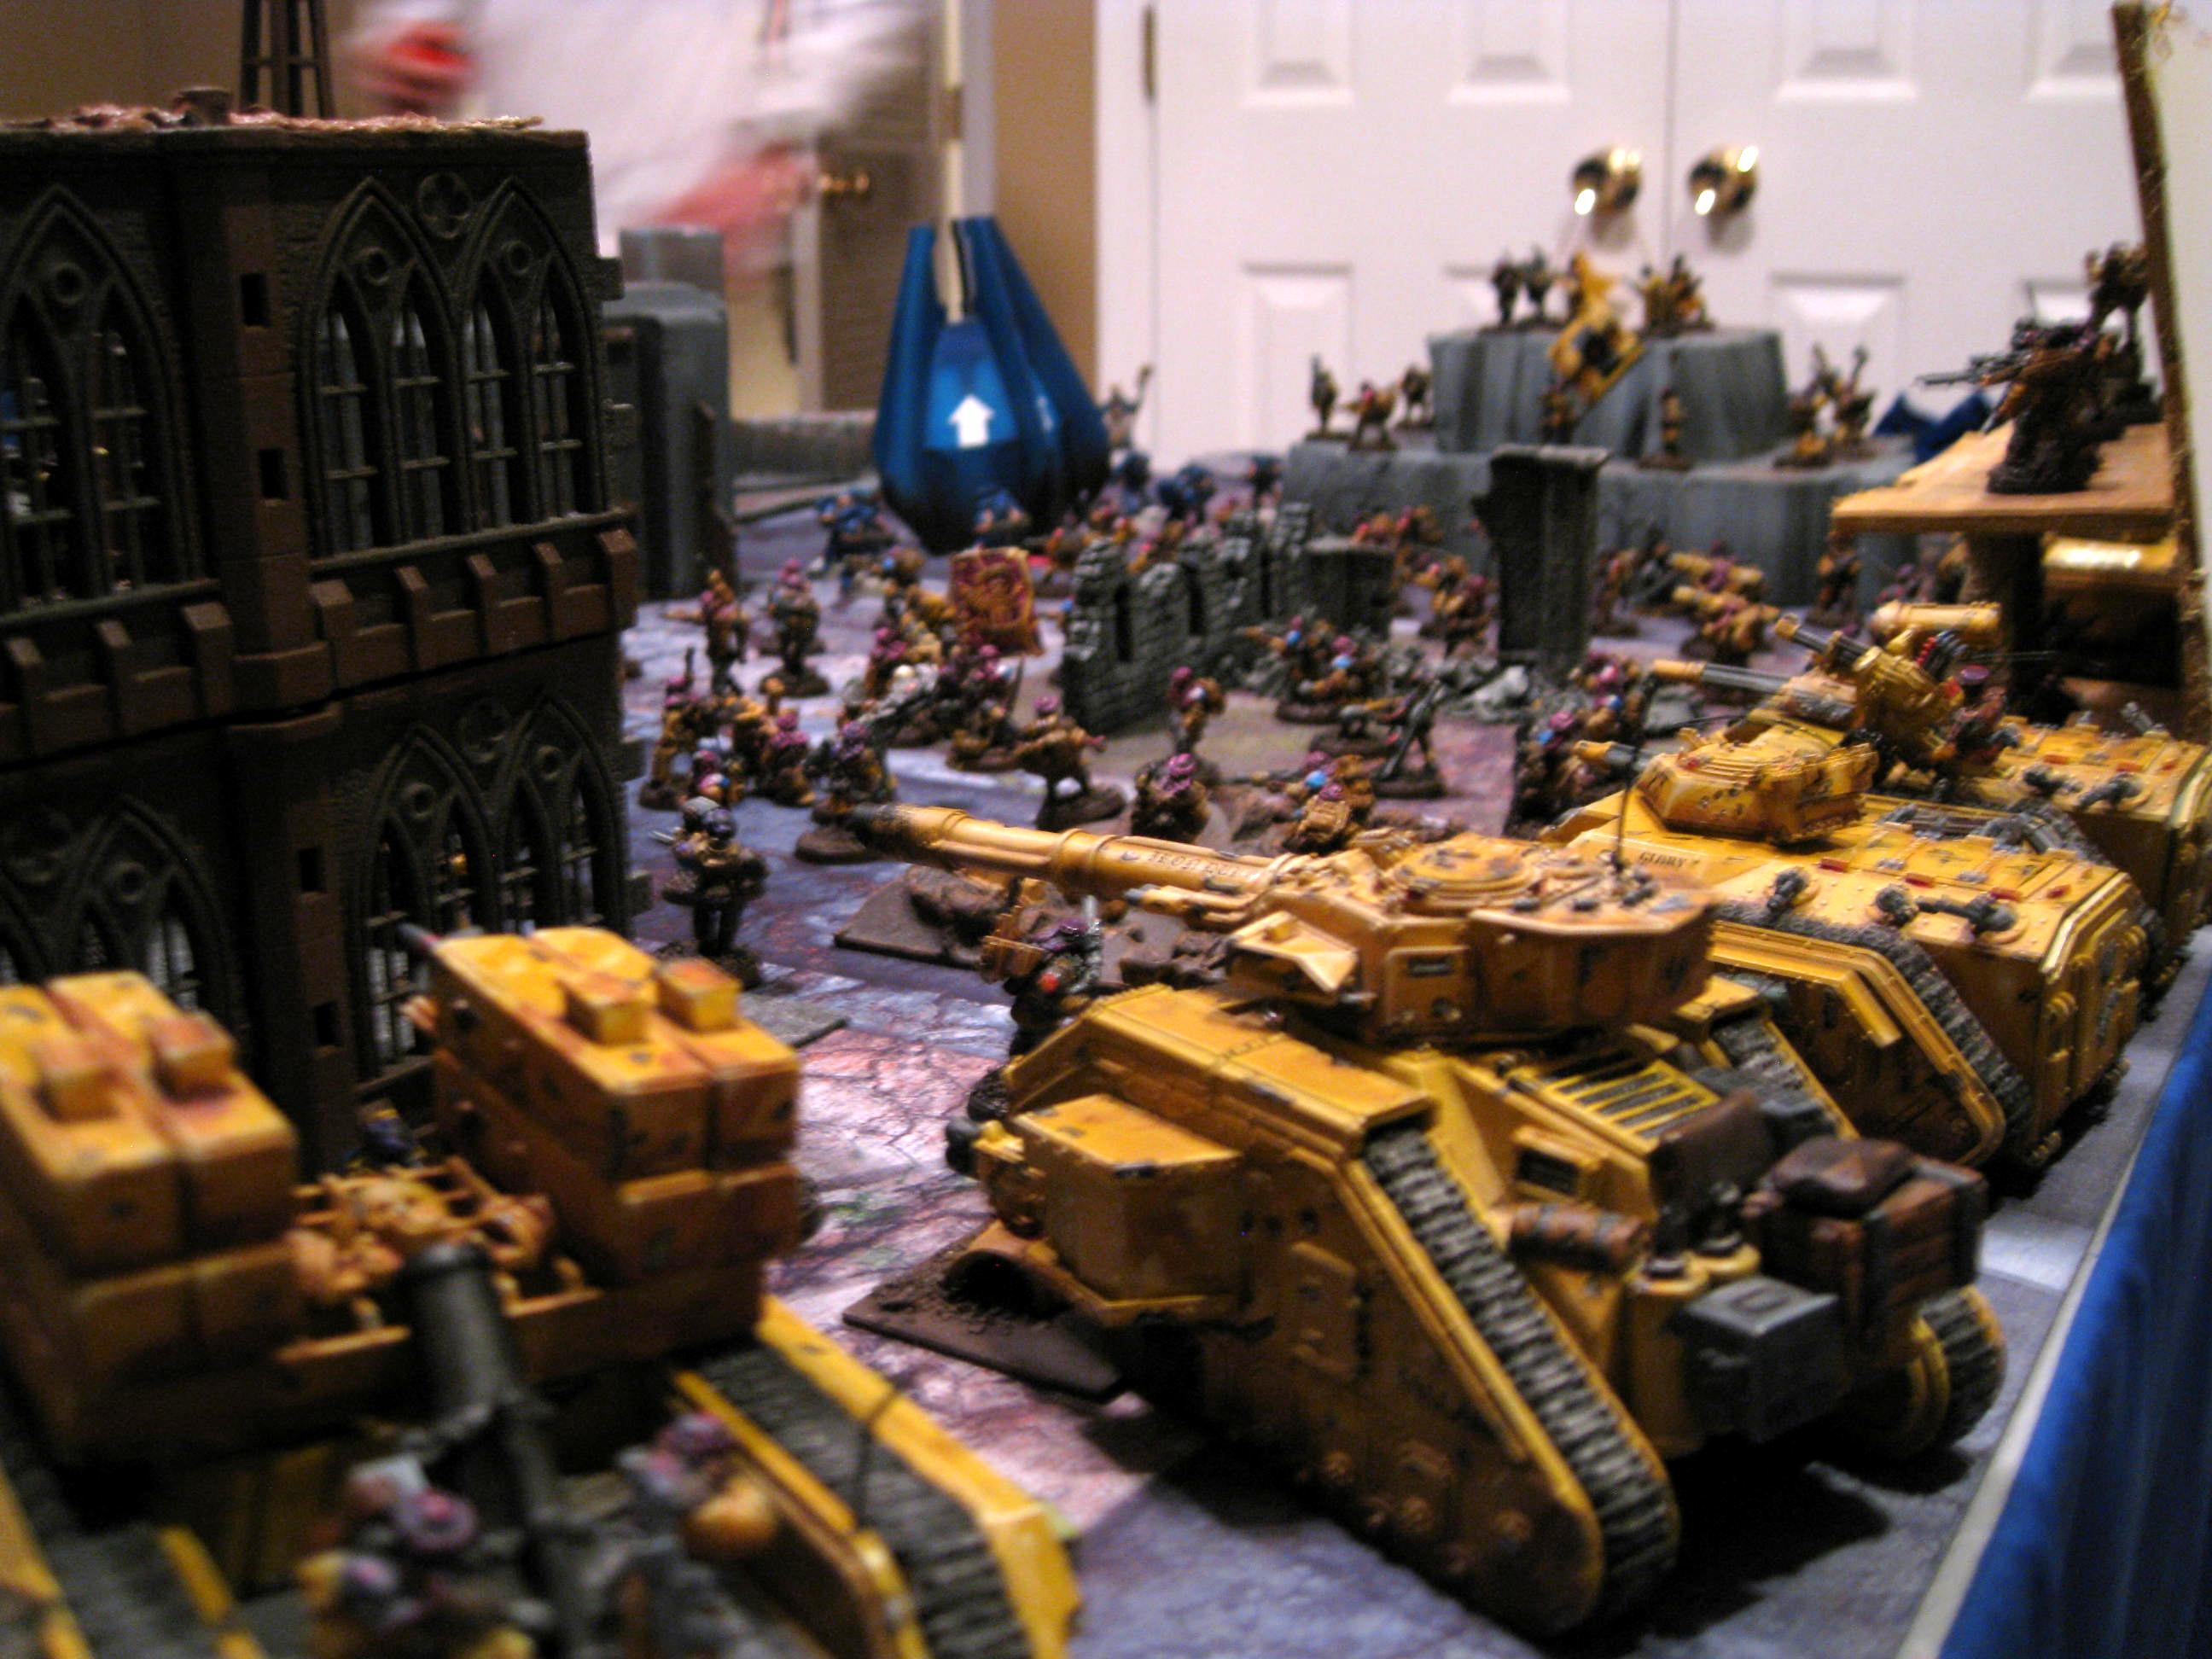 Astra Militarum, Chimera, Imperial Guard, Infantry, Platoon, Tallarn Desert Raiders, Vanquisher, Wyvern